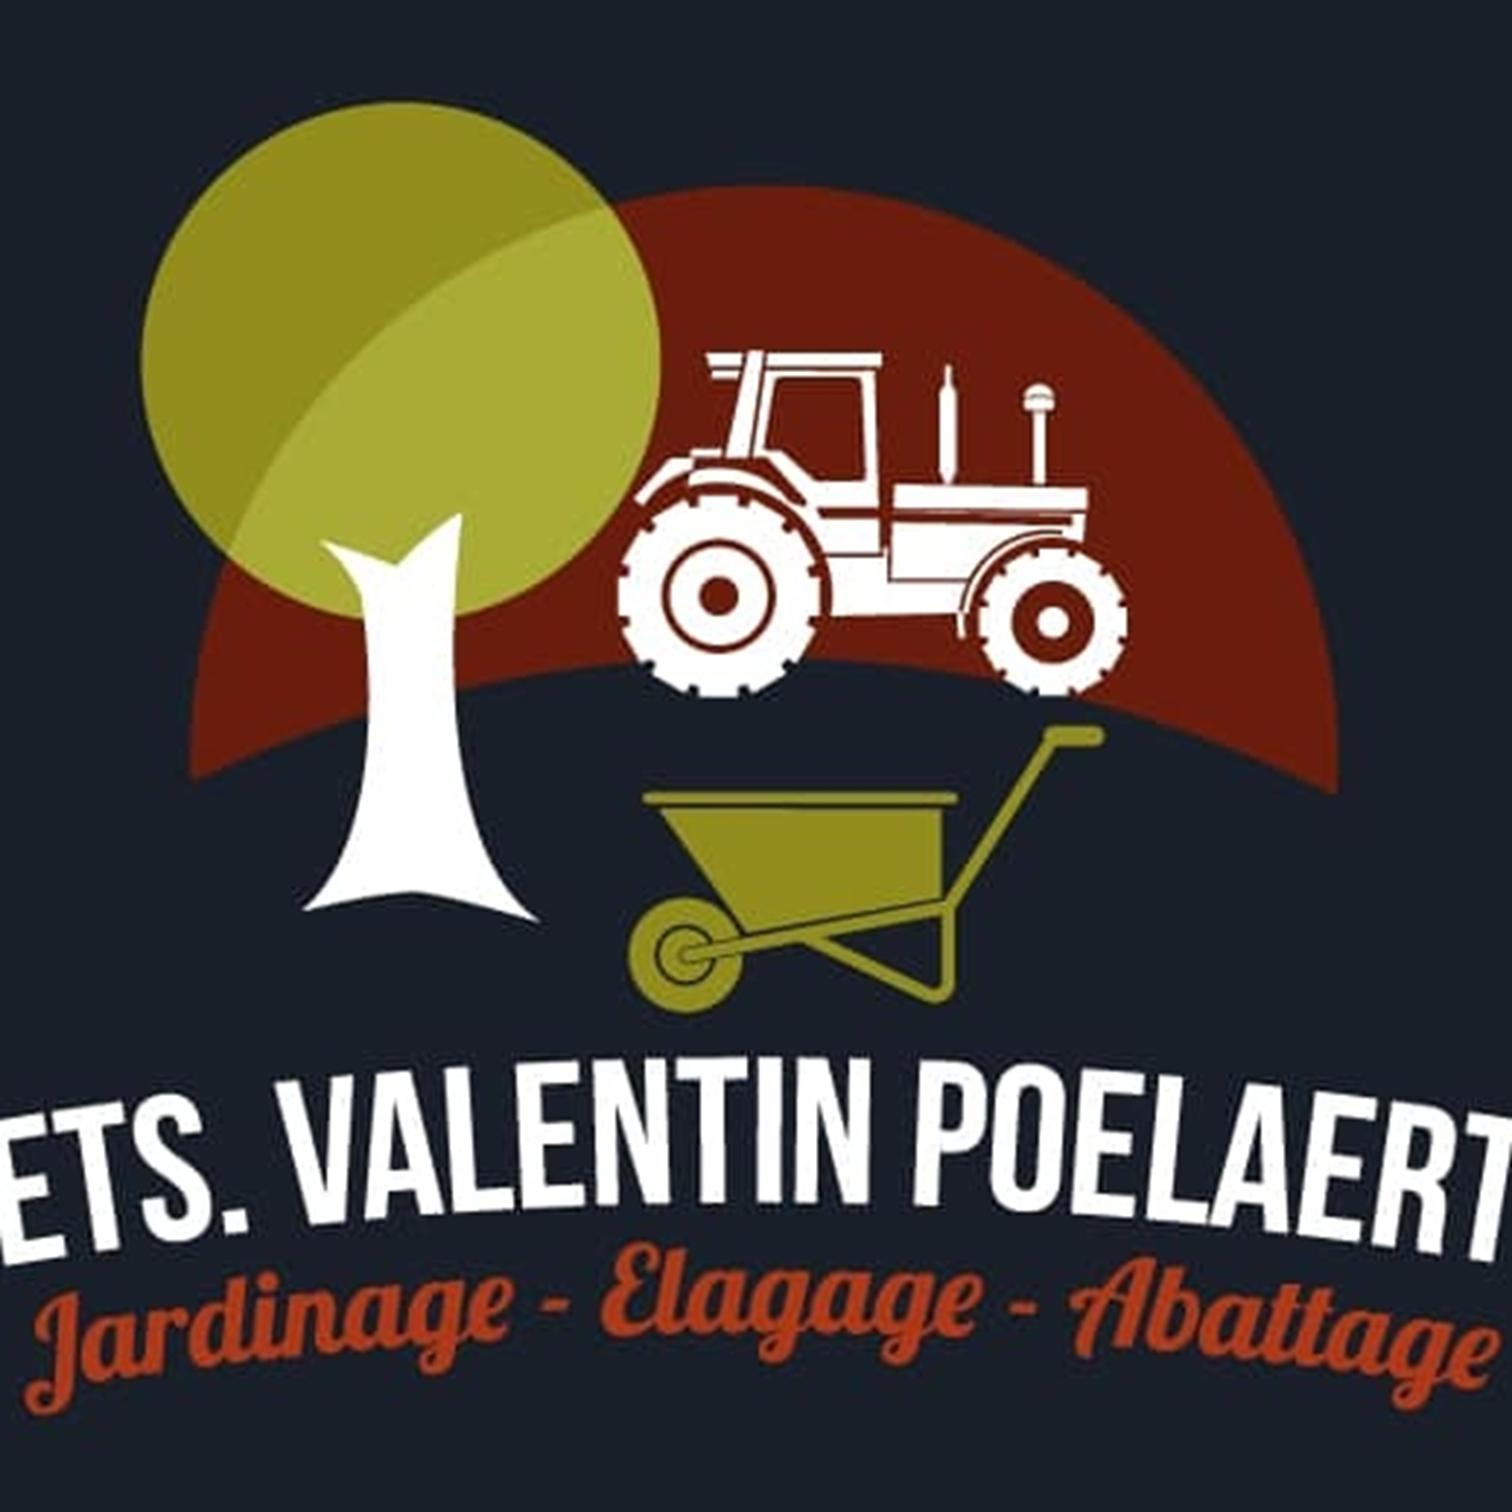 Ets Valentin Poelaert